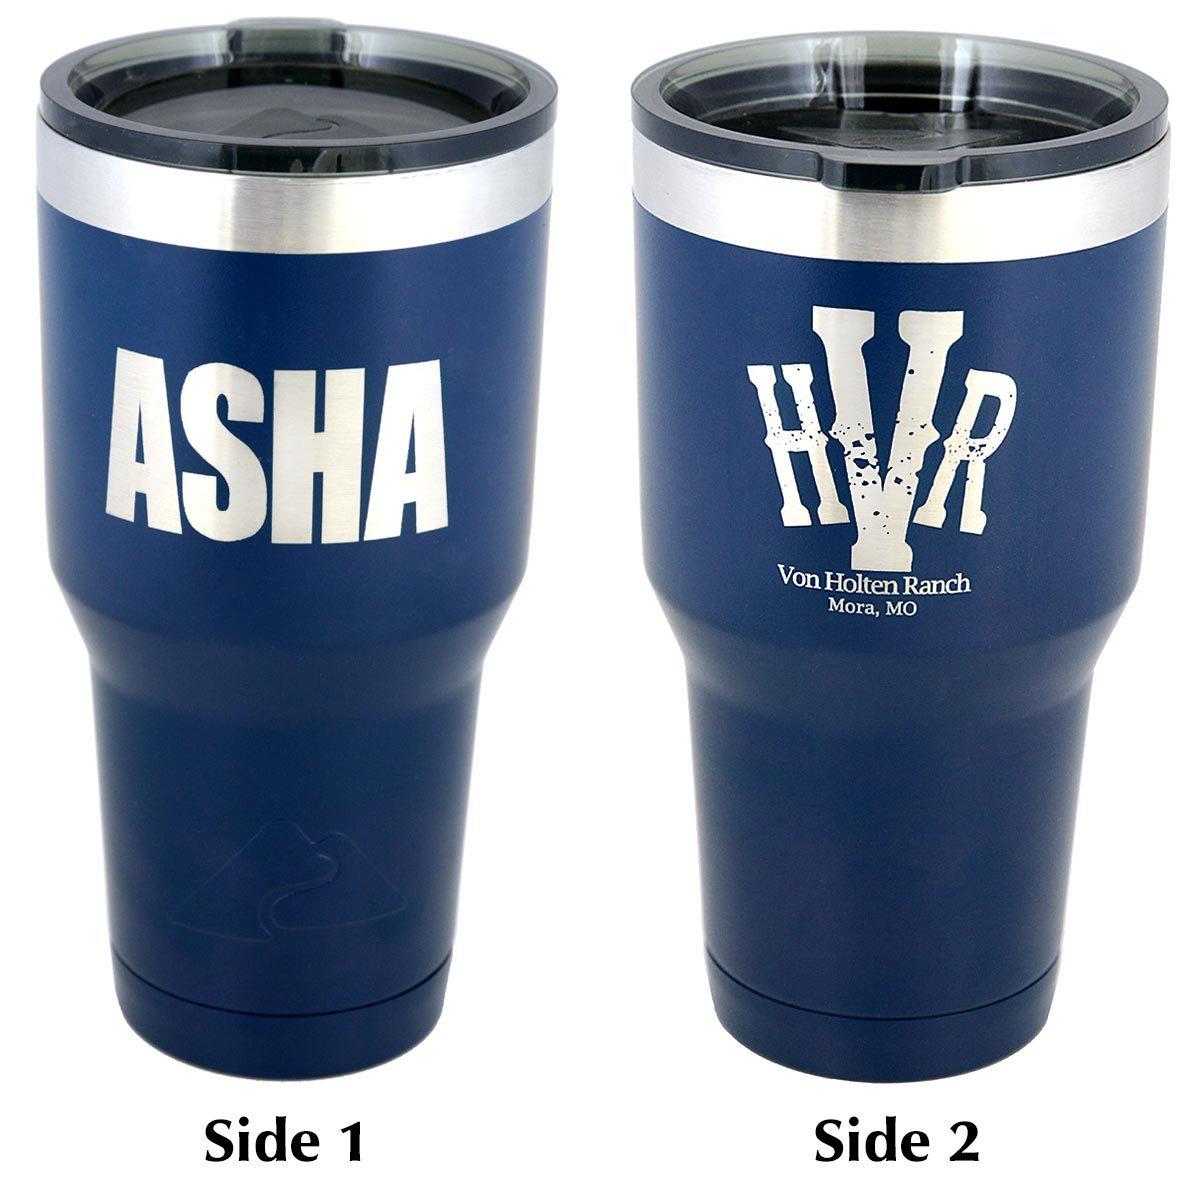 ASHA 30 oz. Insulated Tumbler 30oz-ASHA-tumbler